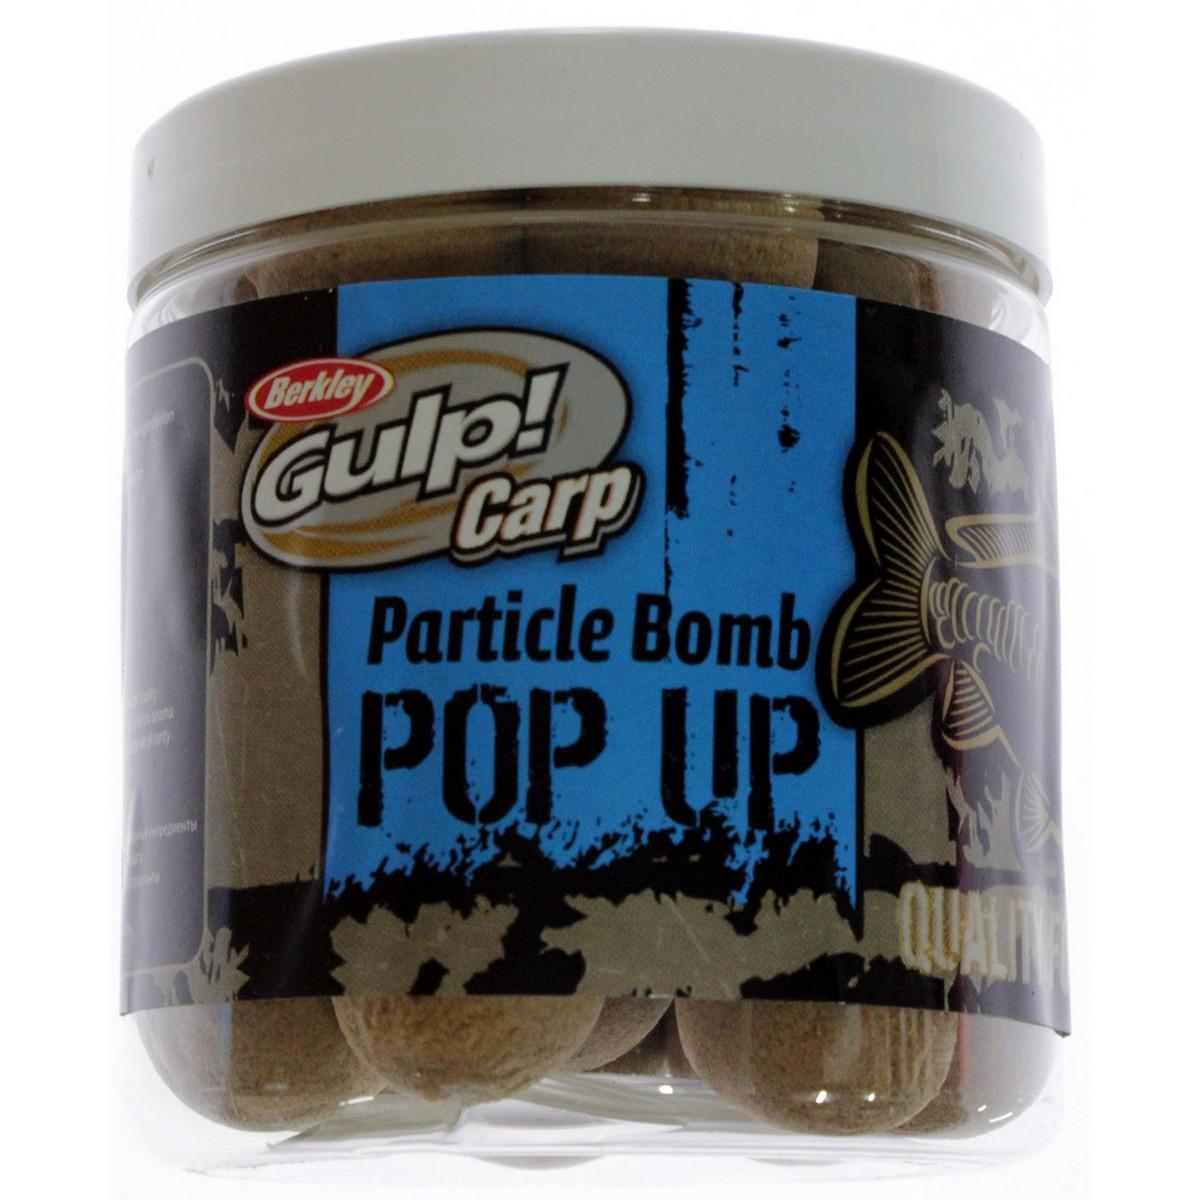 Berkley Gulp! Carp 20мм POP UP